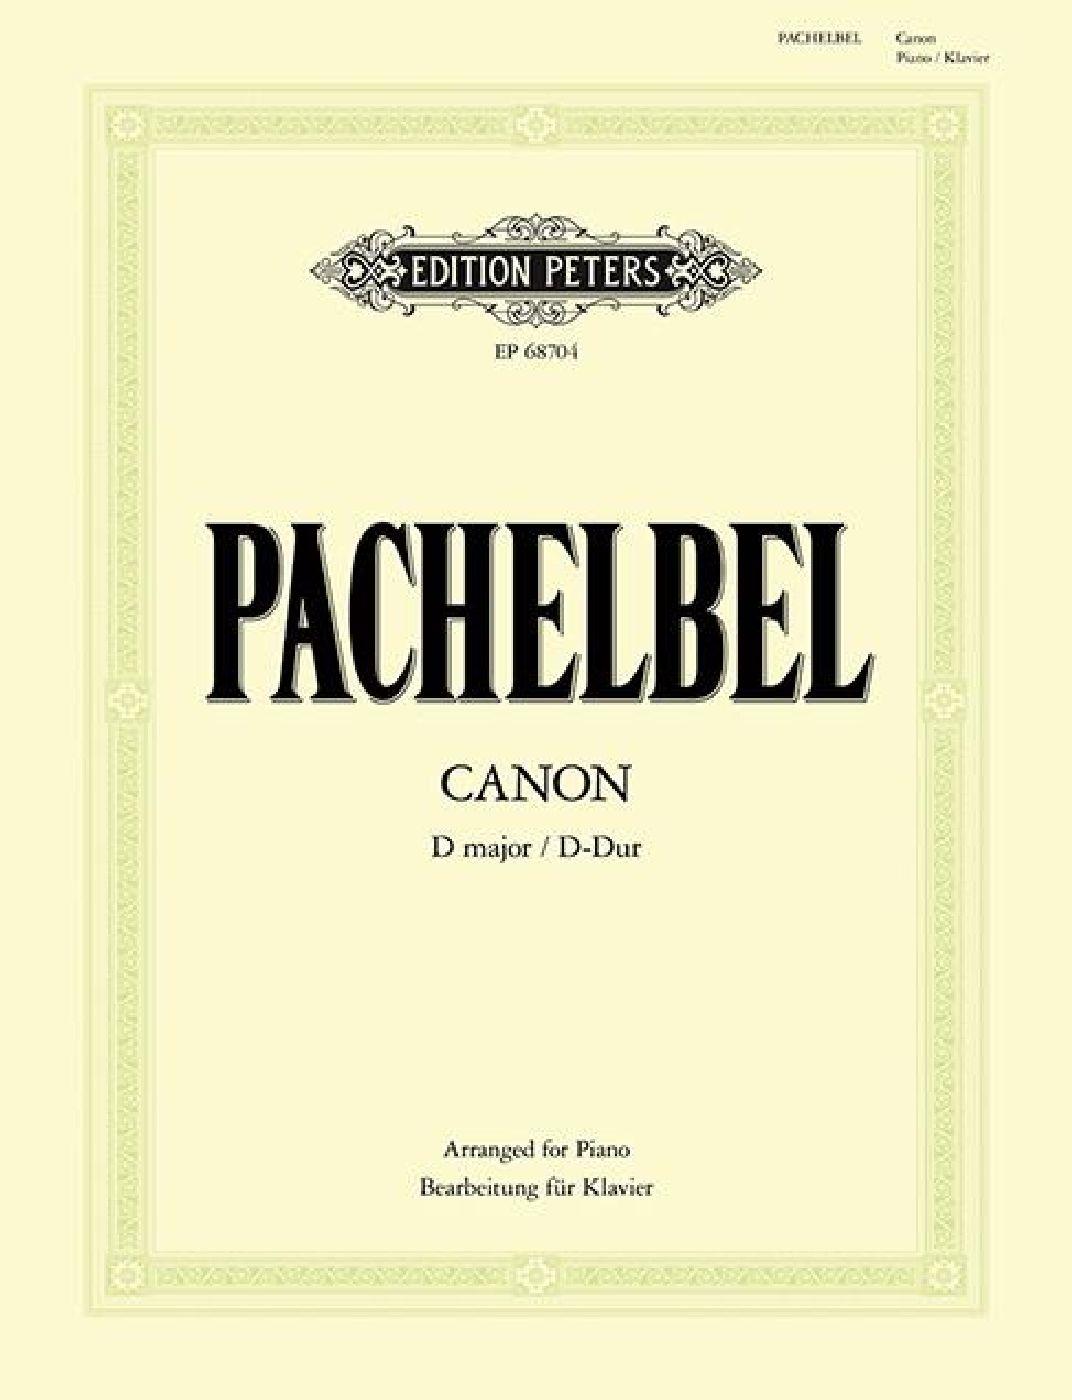 Johann Pachelbel - Canon In D Major - Piano